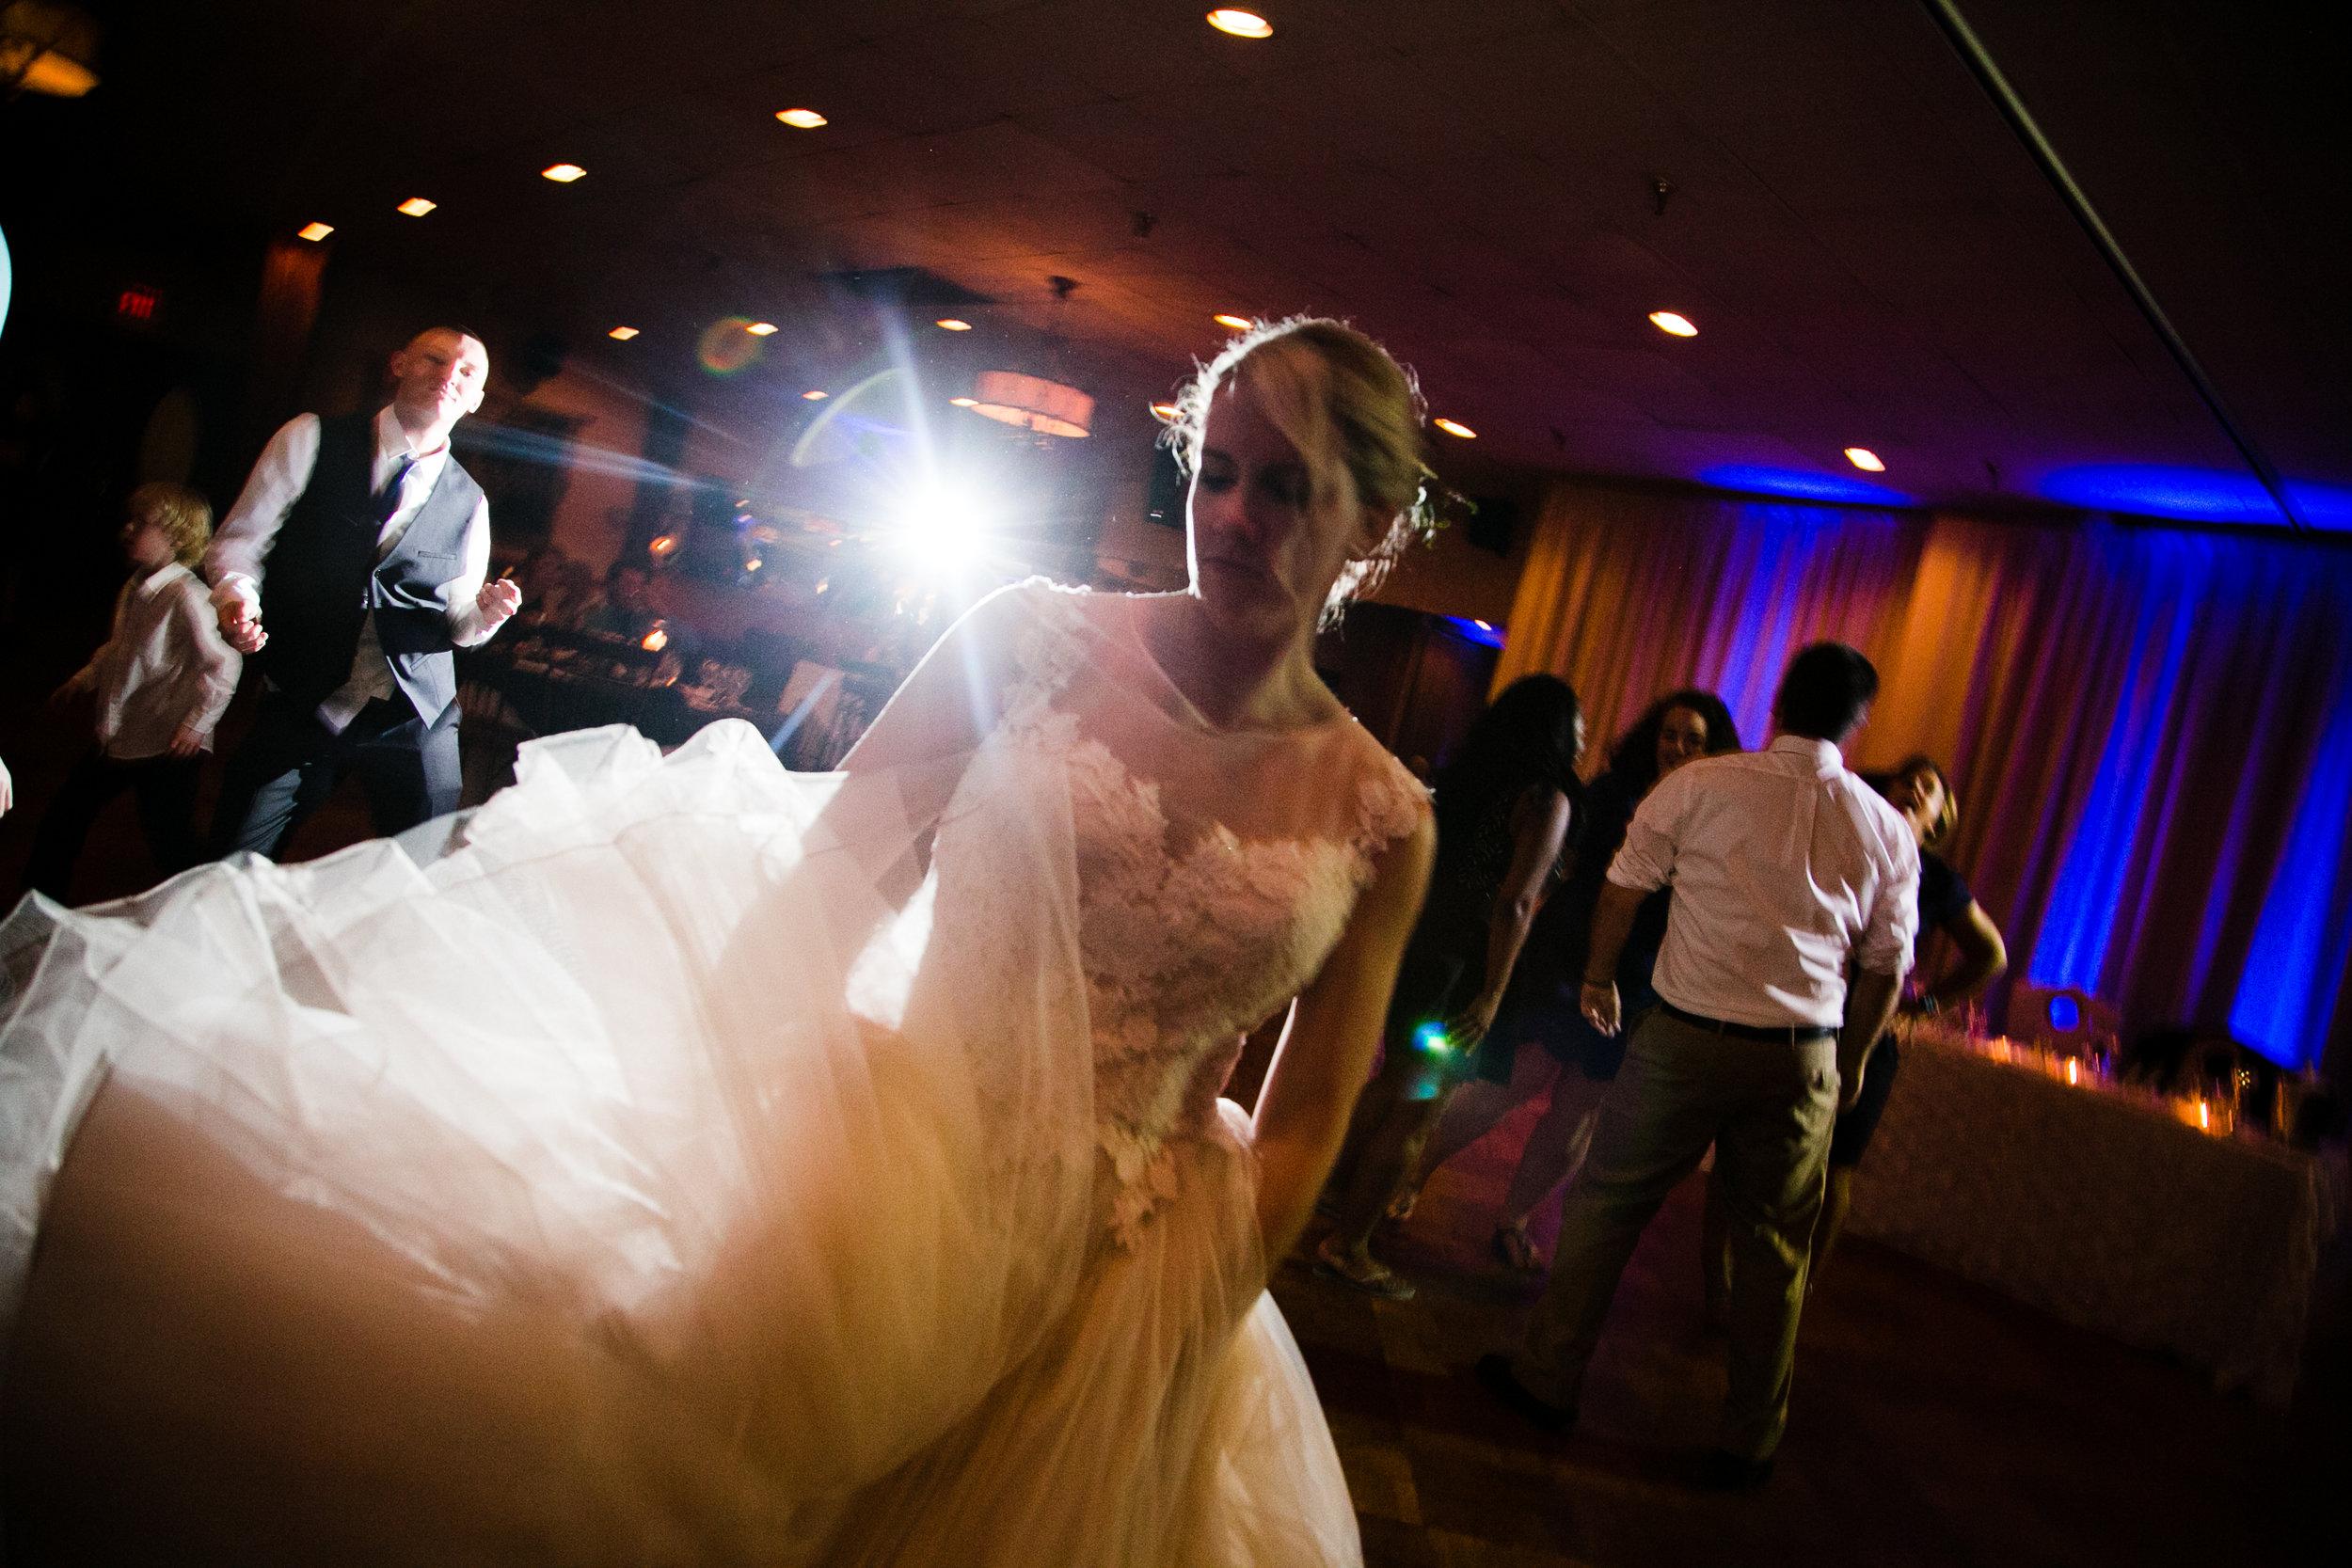 LA LUNA BANQUET HALL WEDDING BENSALEM - 138.jpg